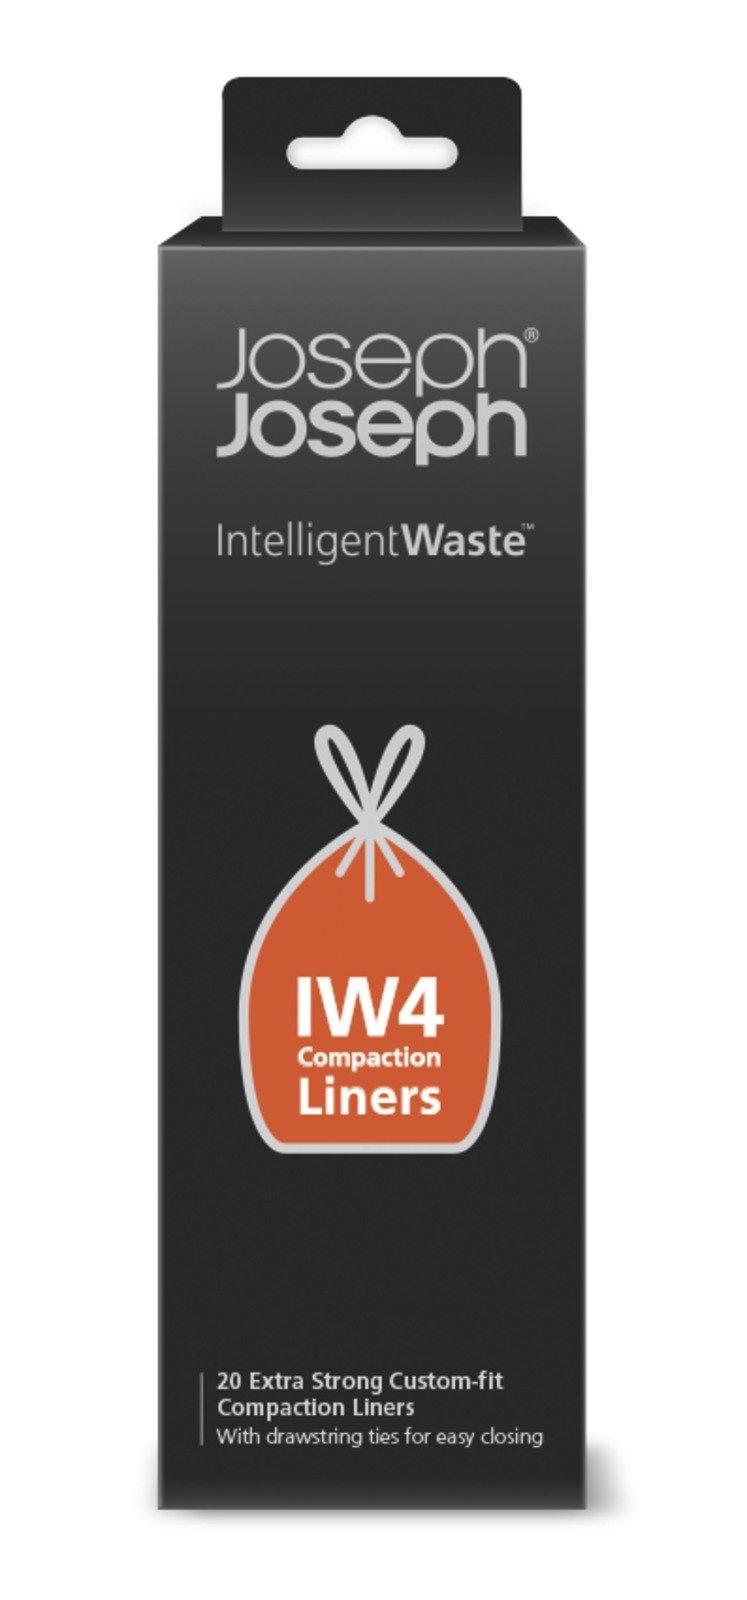 Joseph Joseph 30027 Intelligent Waste IW4 Compaction Bin Liners for Titan 8 gallon / 30 liter, Pack of 20, Black by Joseph Joseph